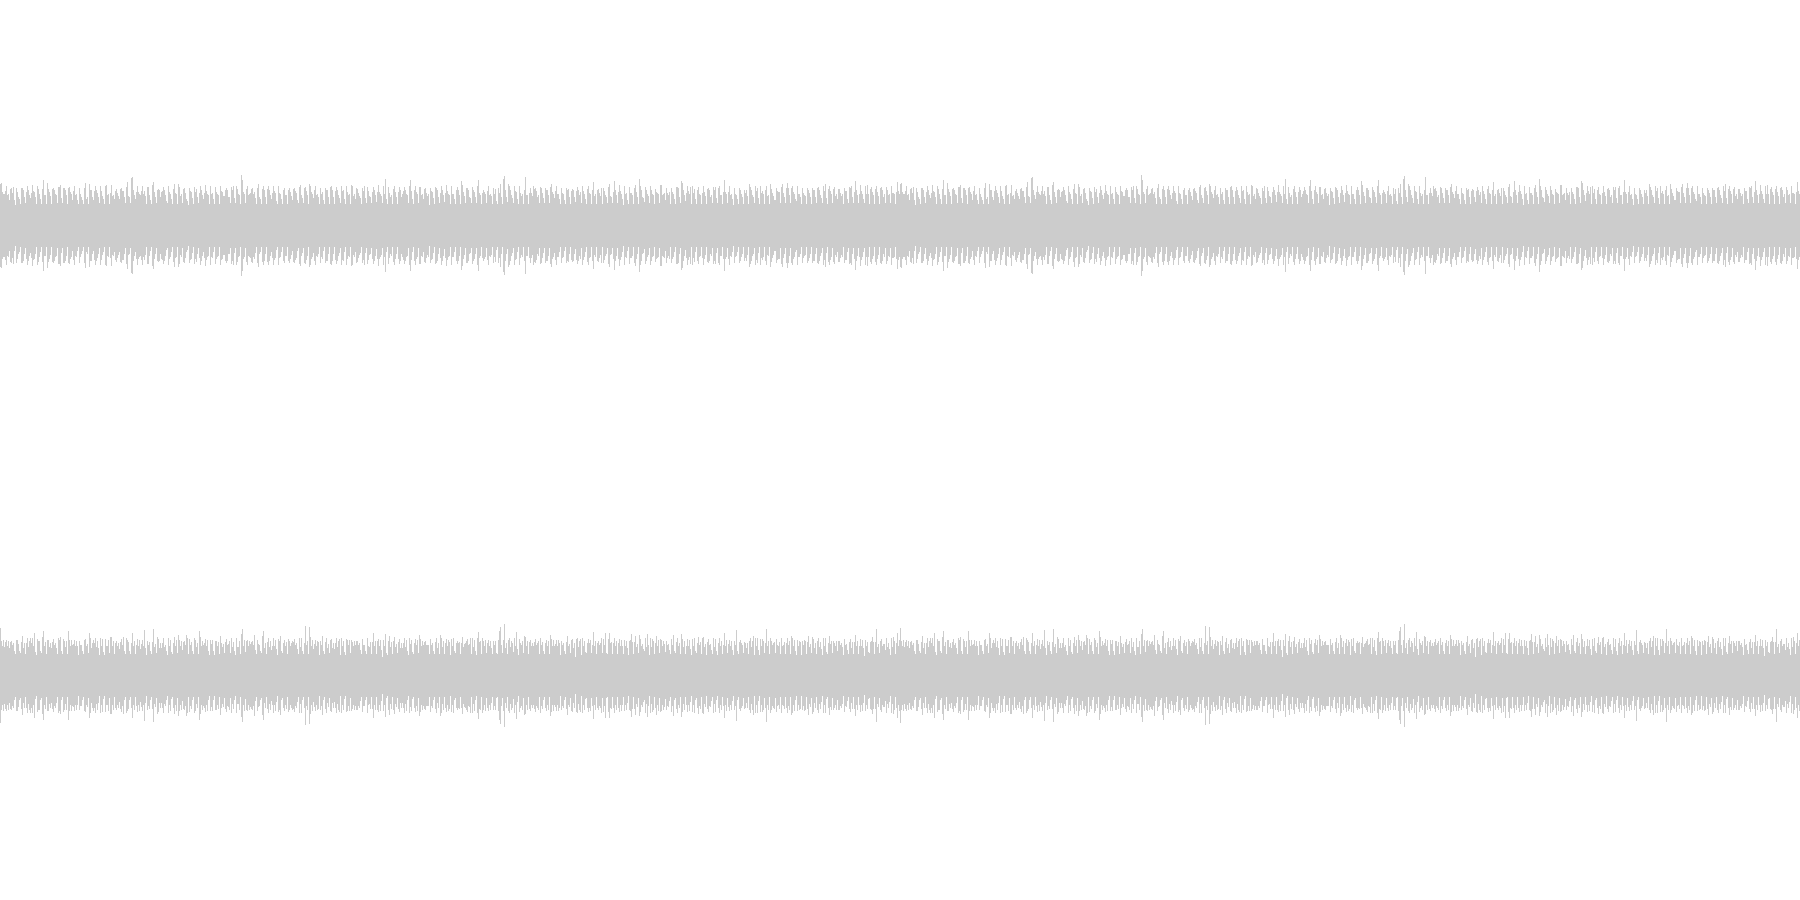 ASMR 音フェチApp用 ノイズ 6の未再生の波形